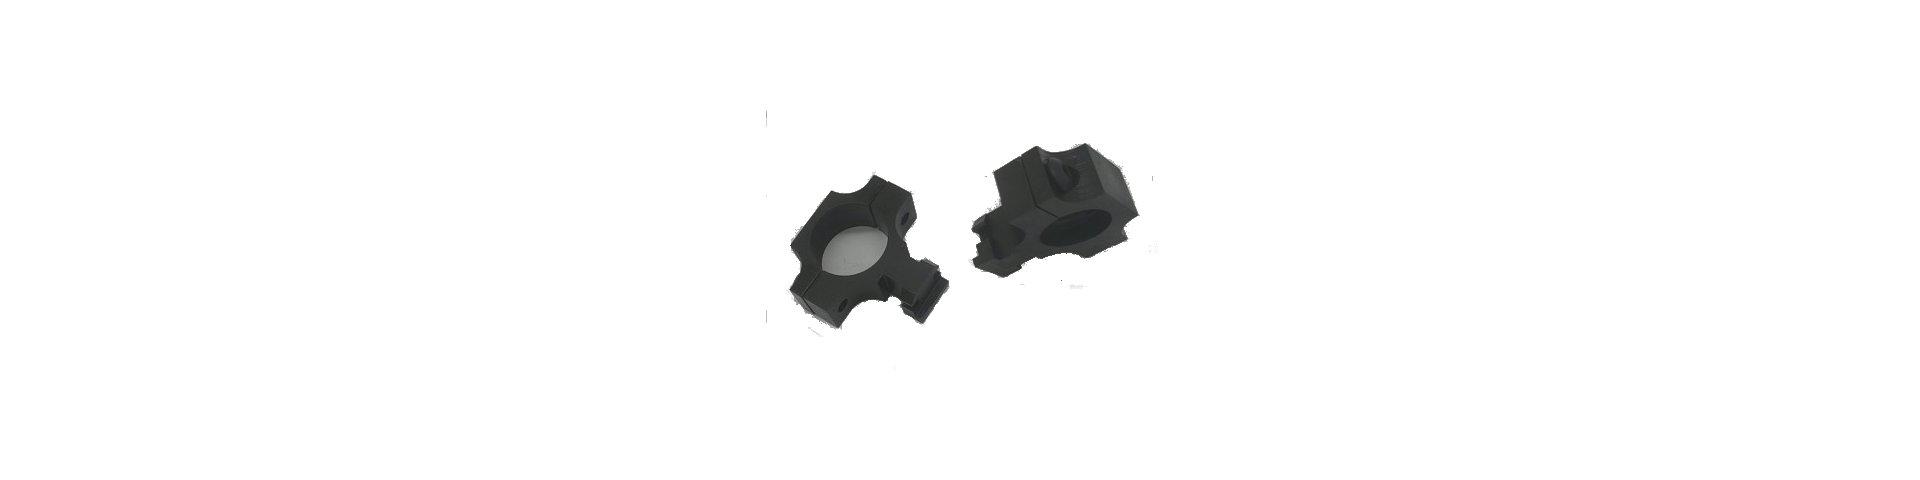 https://www.triple-r-products.com/catalog/bolt-on-clamp-on-bayonet-lug/bolt-on-clamp-on-ar15-bayonet-lug-kit